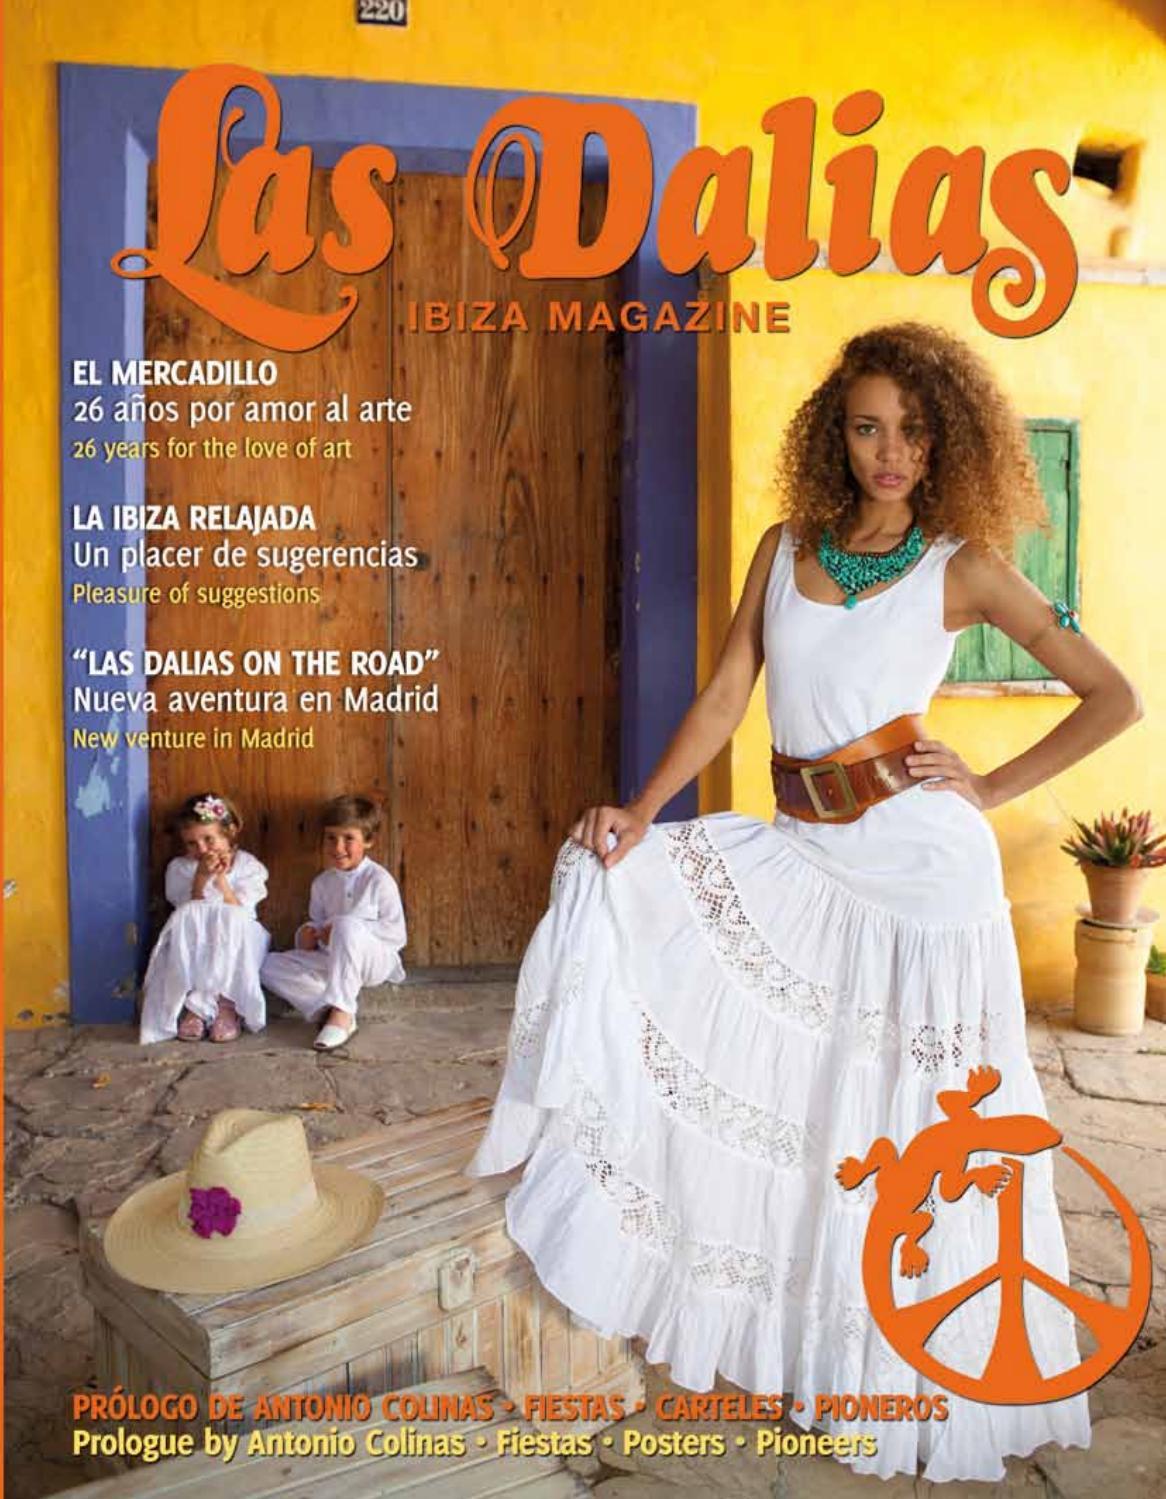 Las Ibiza Issuu Dalias Magazine 2011 By hCxsQdtr